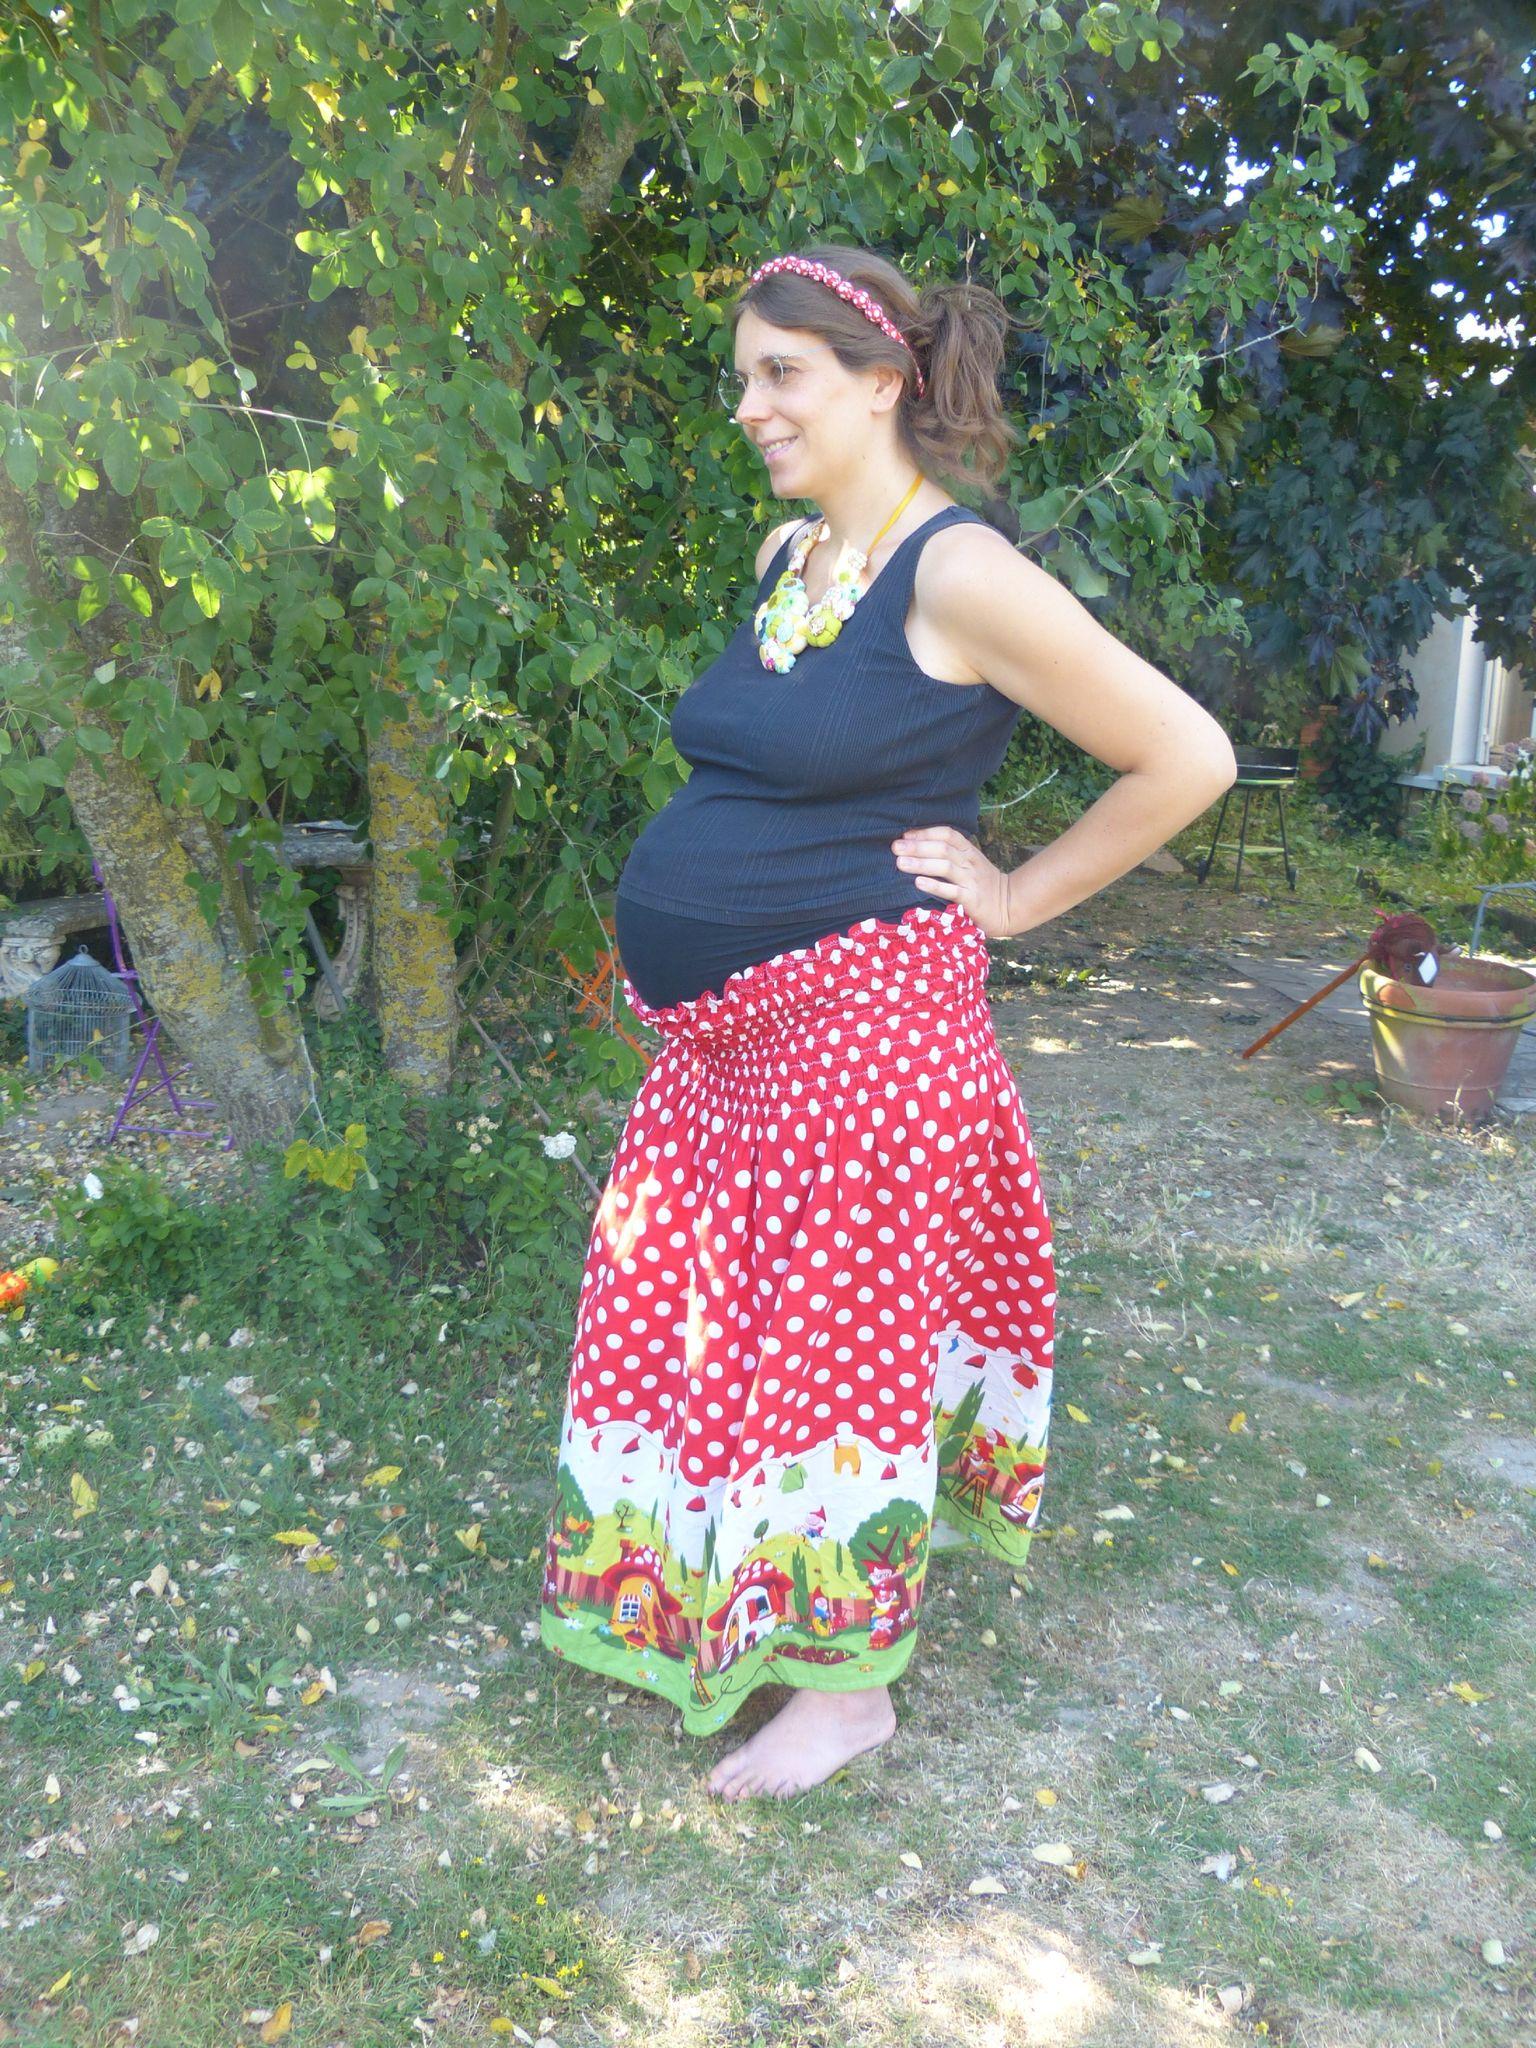 Grosse Dame Image mon jupon de grosse dame - margotte aux pomme